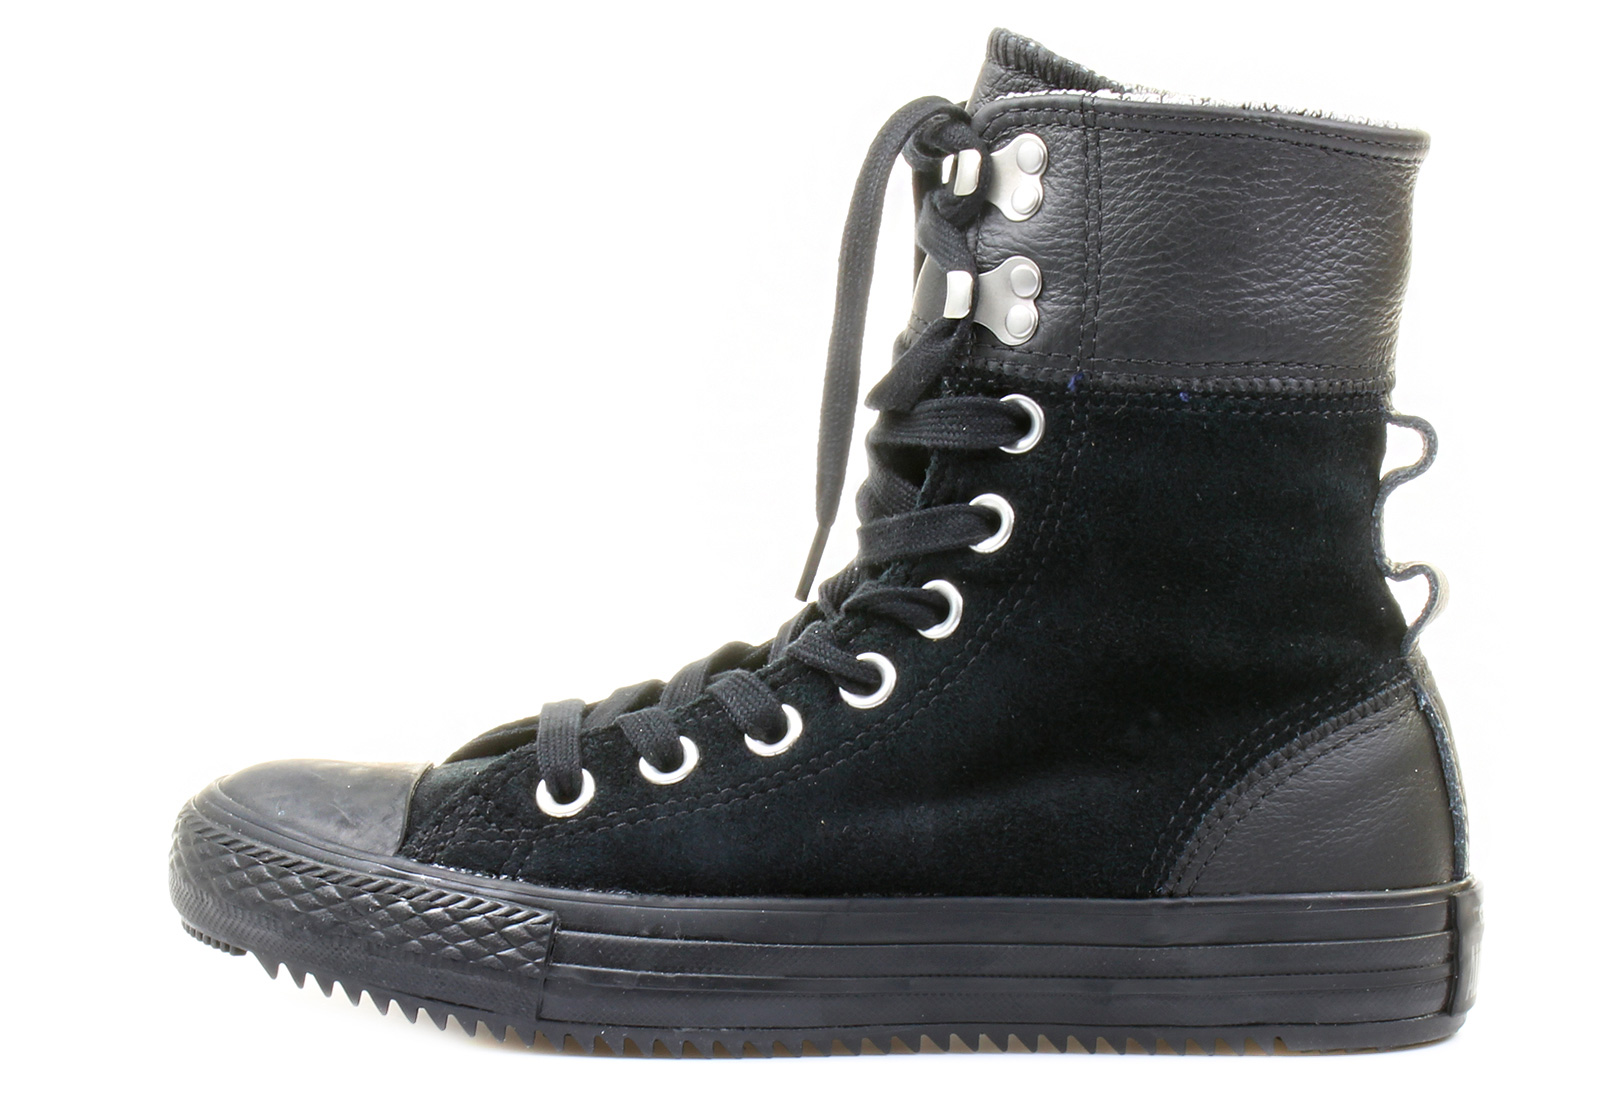 9e723b50f Converse Sneakers - Chuck Taylor All Star Elsie Rolldown Hi ...